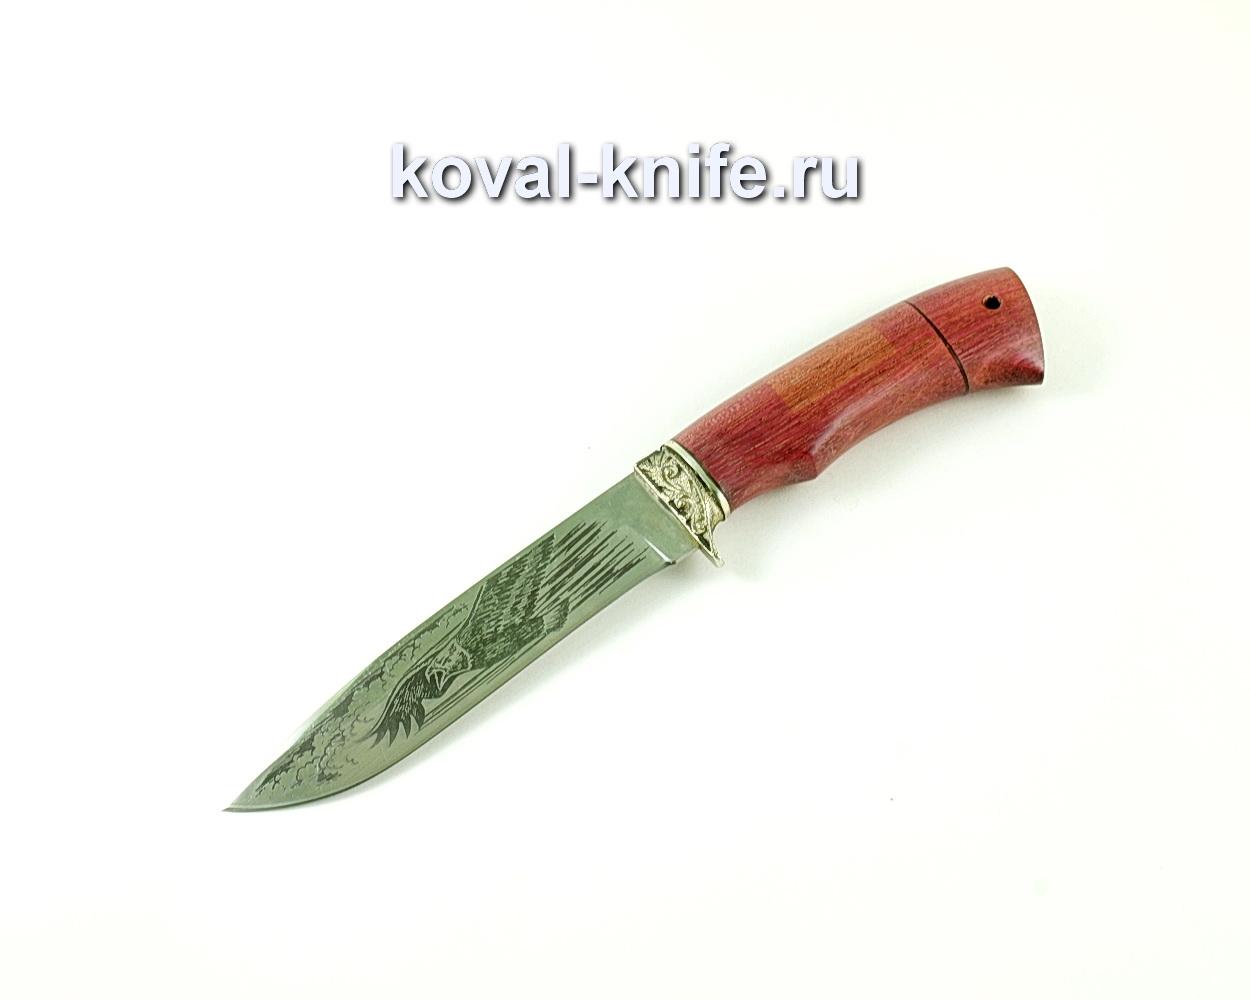 Нож Олимп (сталь 65х13), рукоять амарант, литье A172